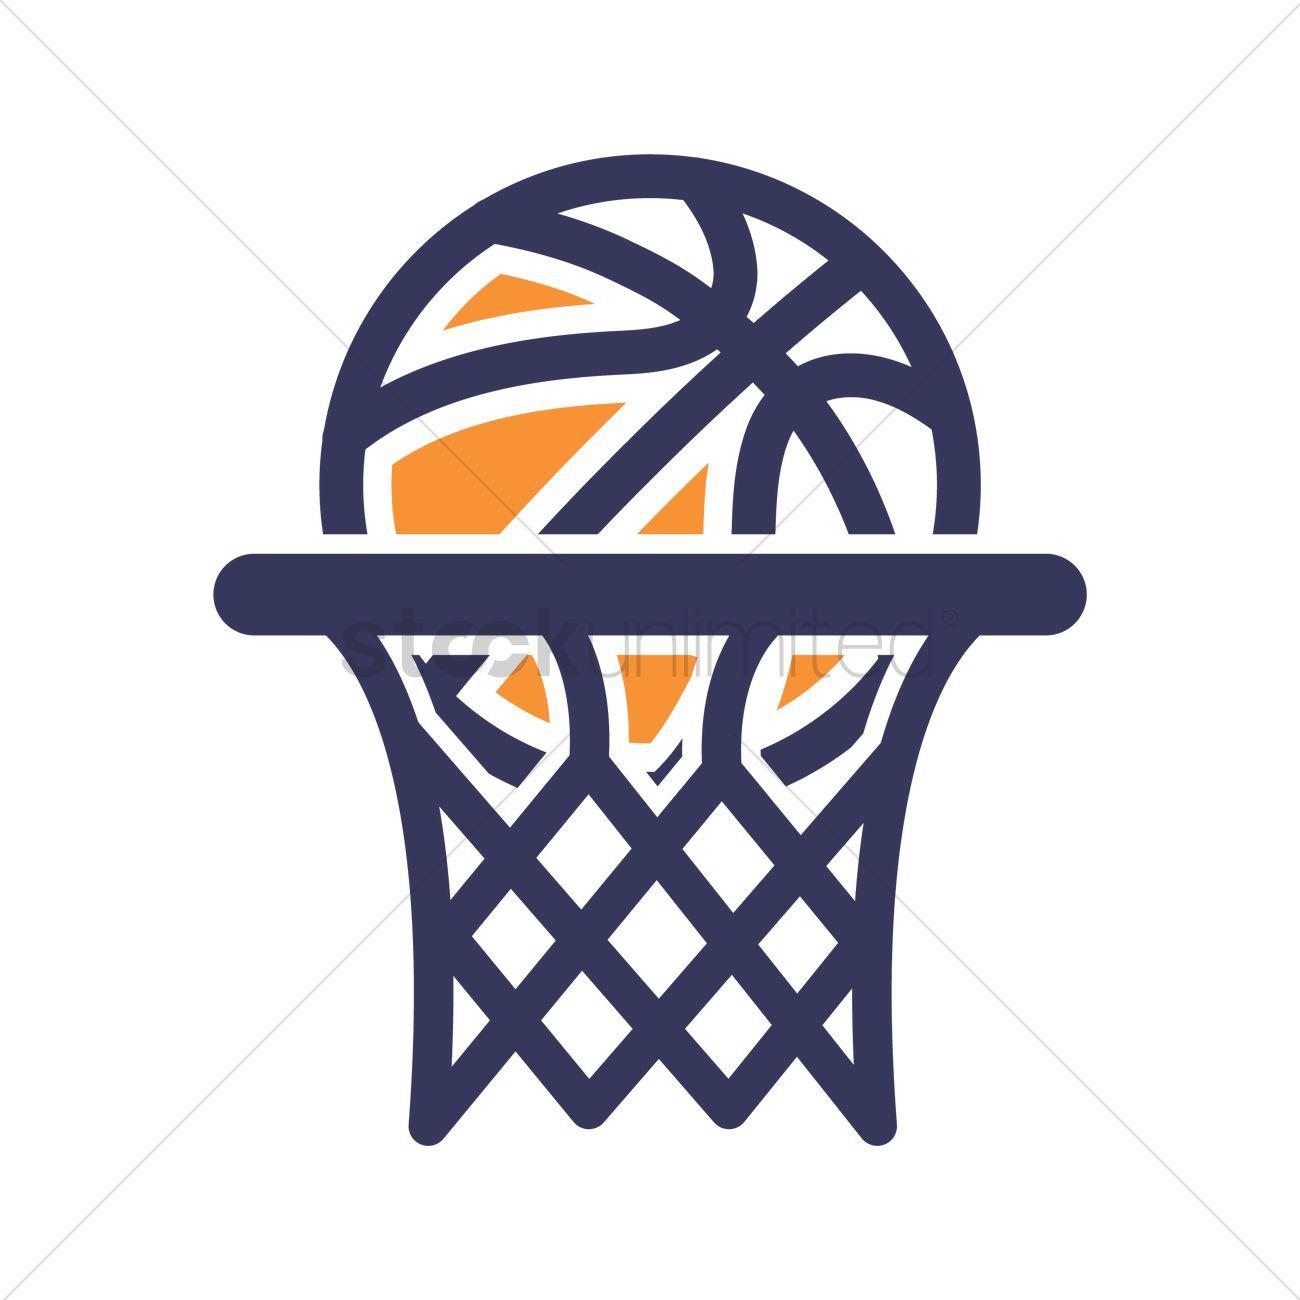 Basketball hoop icon Vector Image - 1984920 | StockUnlimited